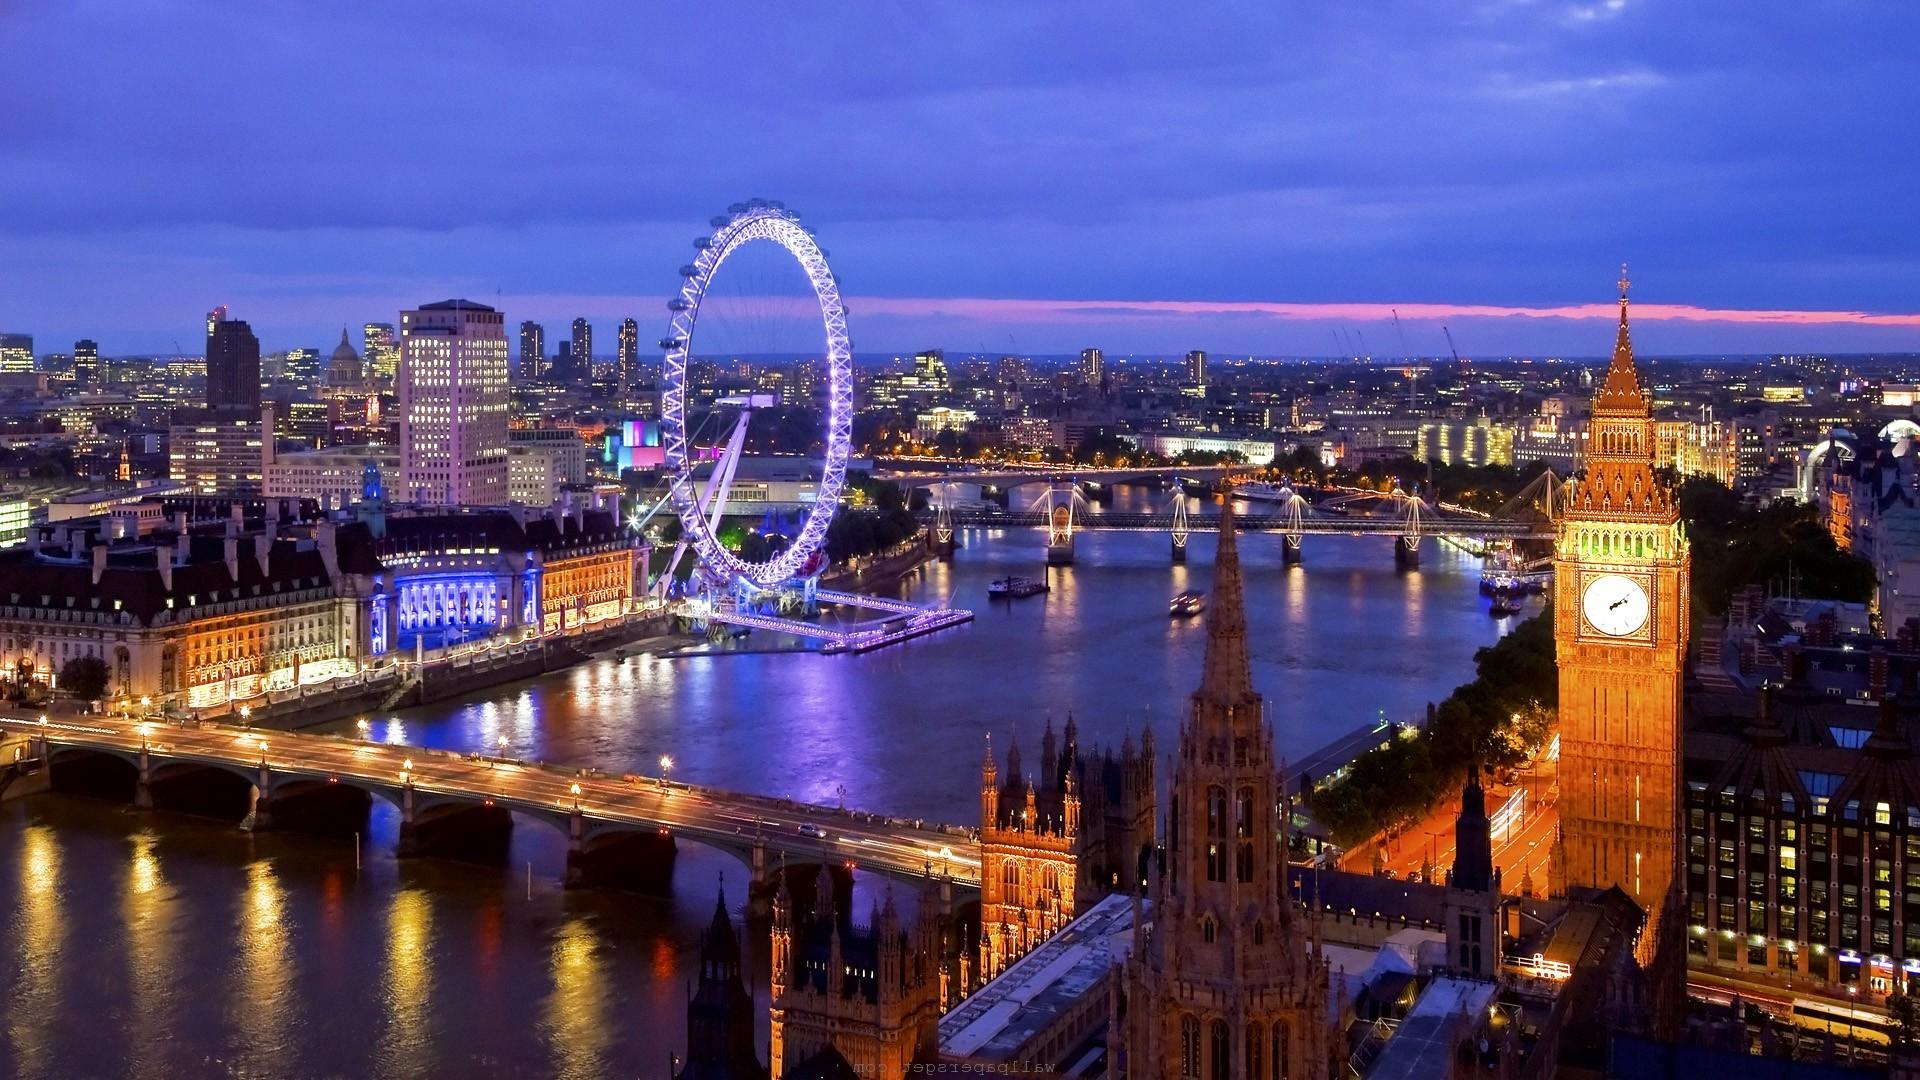 United london 60 fps images 53